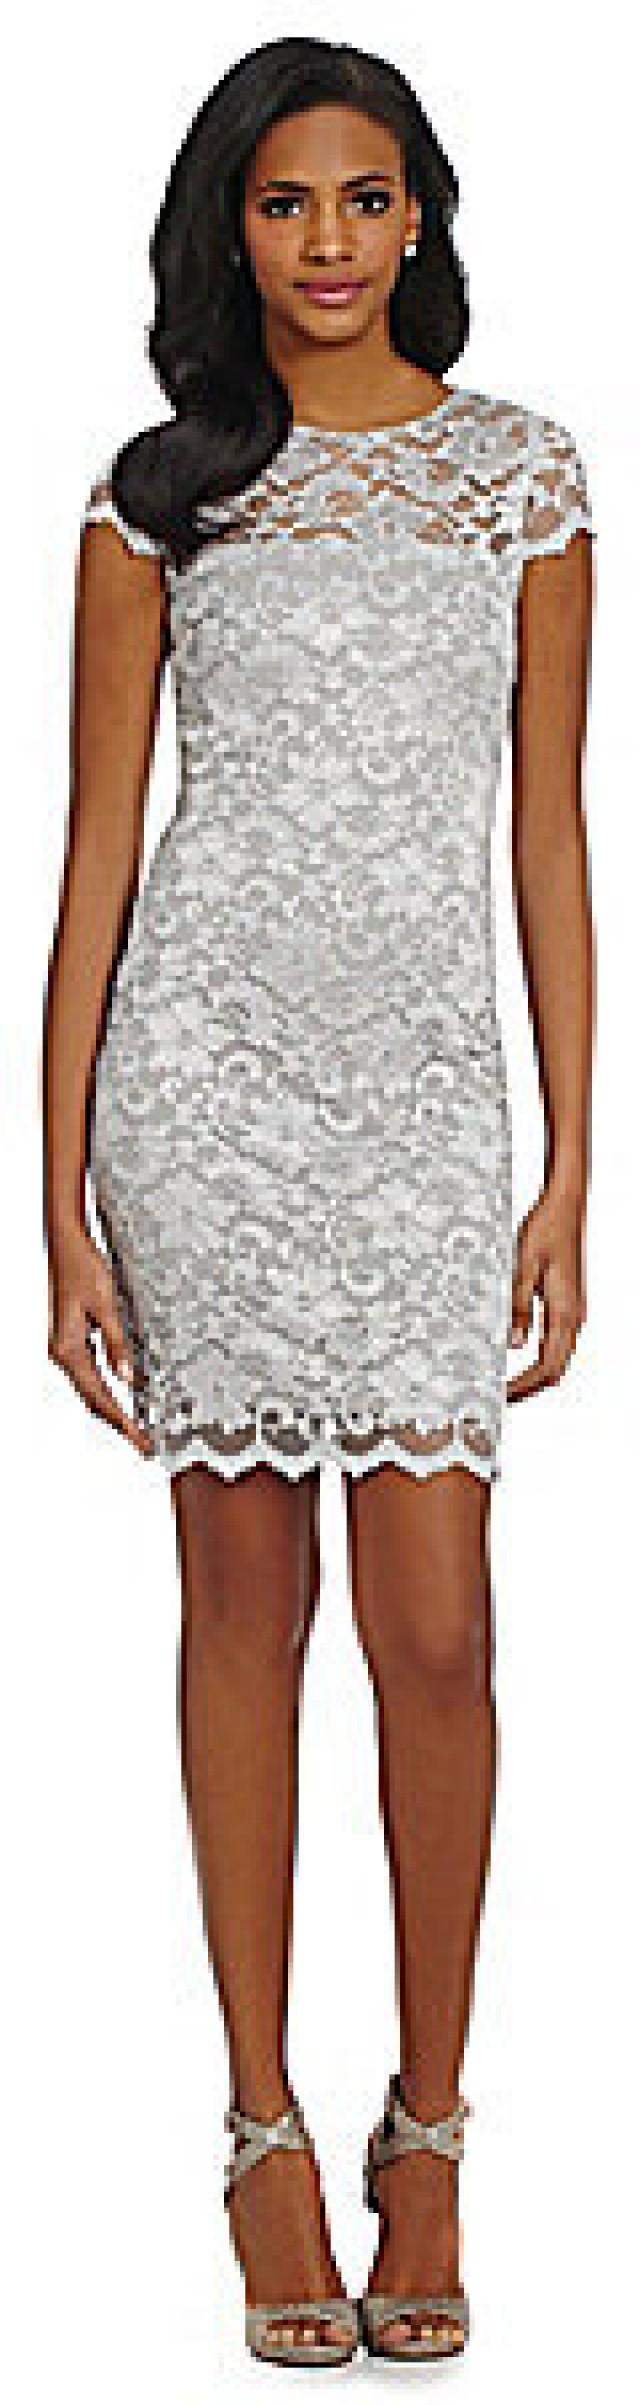 Belle Badgley Mischka Illusion-Neckline Lace Sheath Dress #2267927 ...